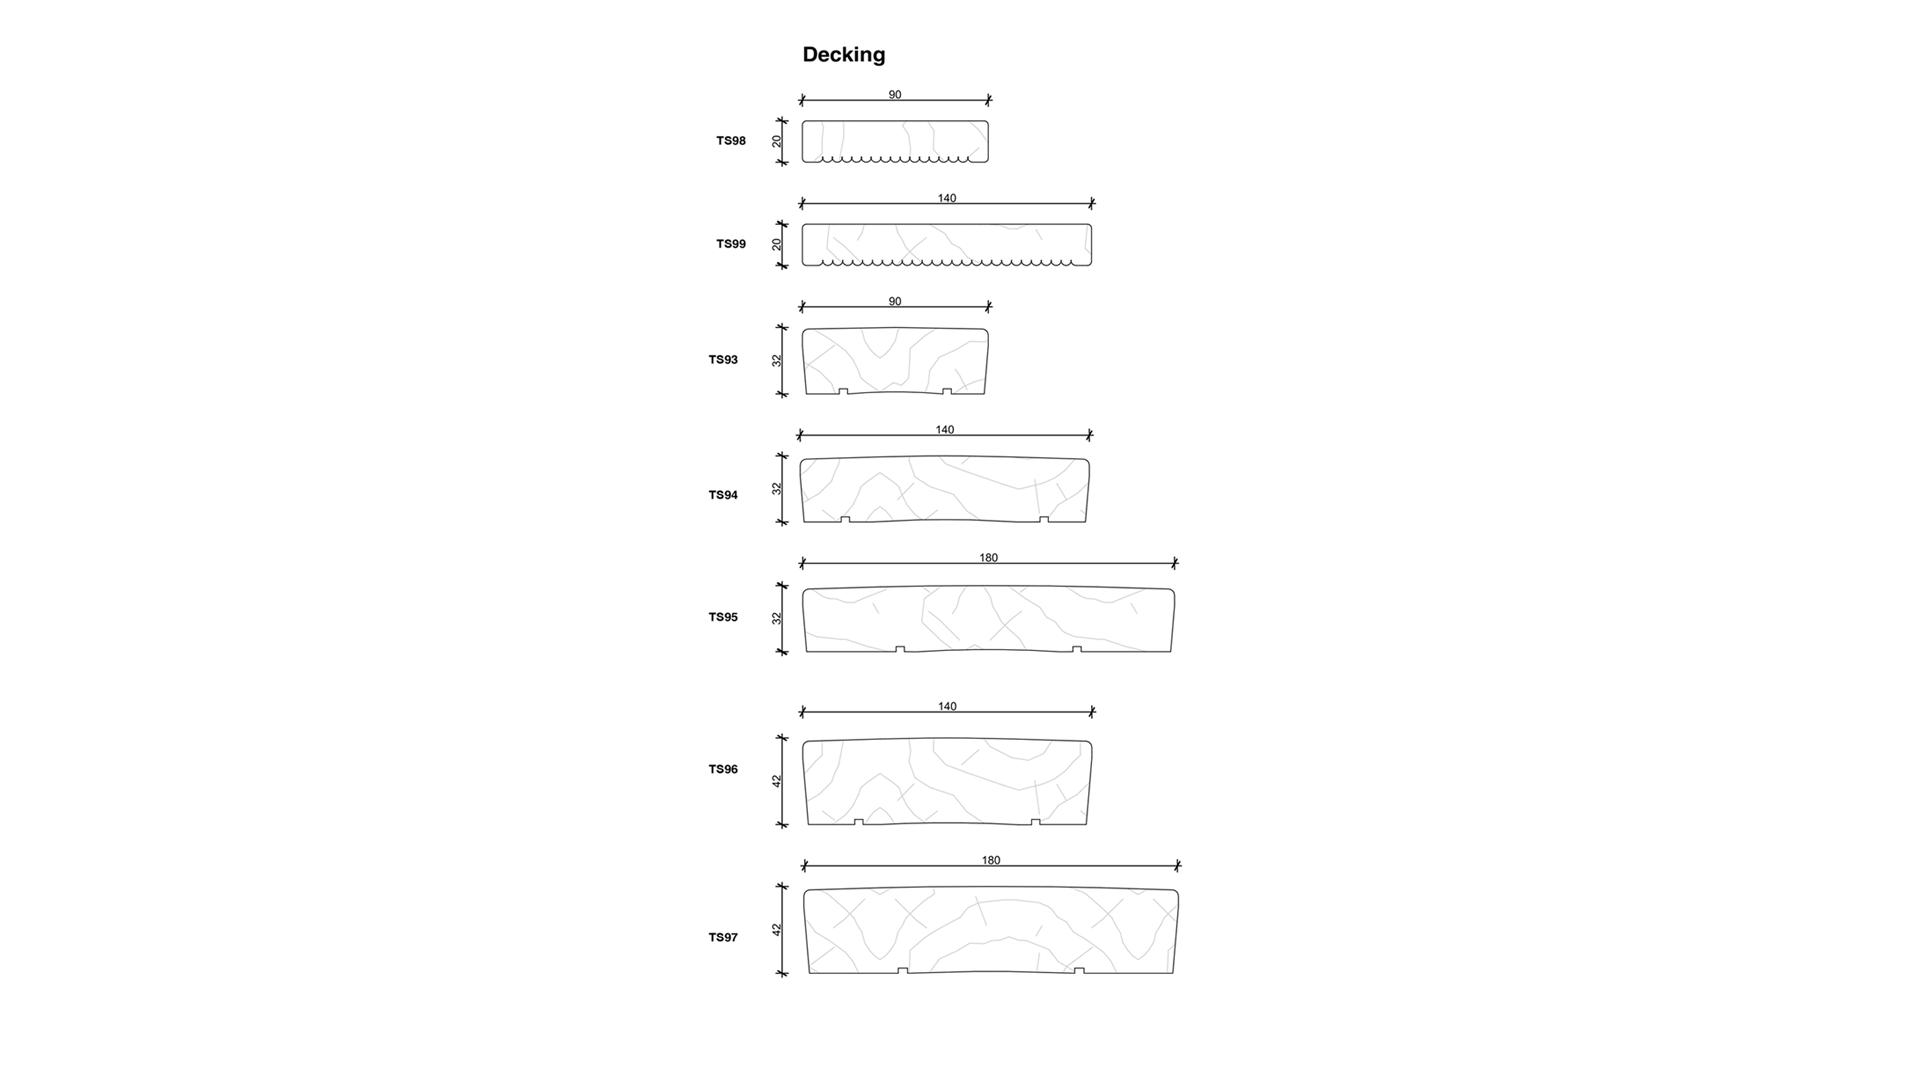 TS Profiles - Decking